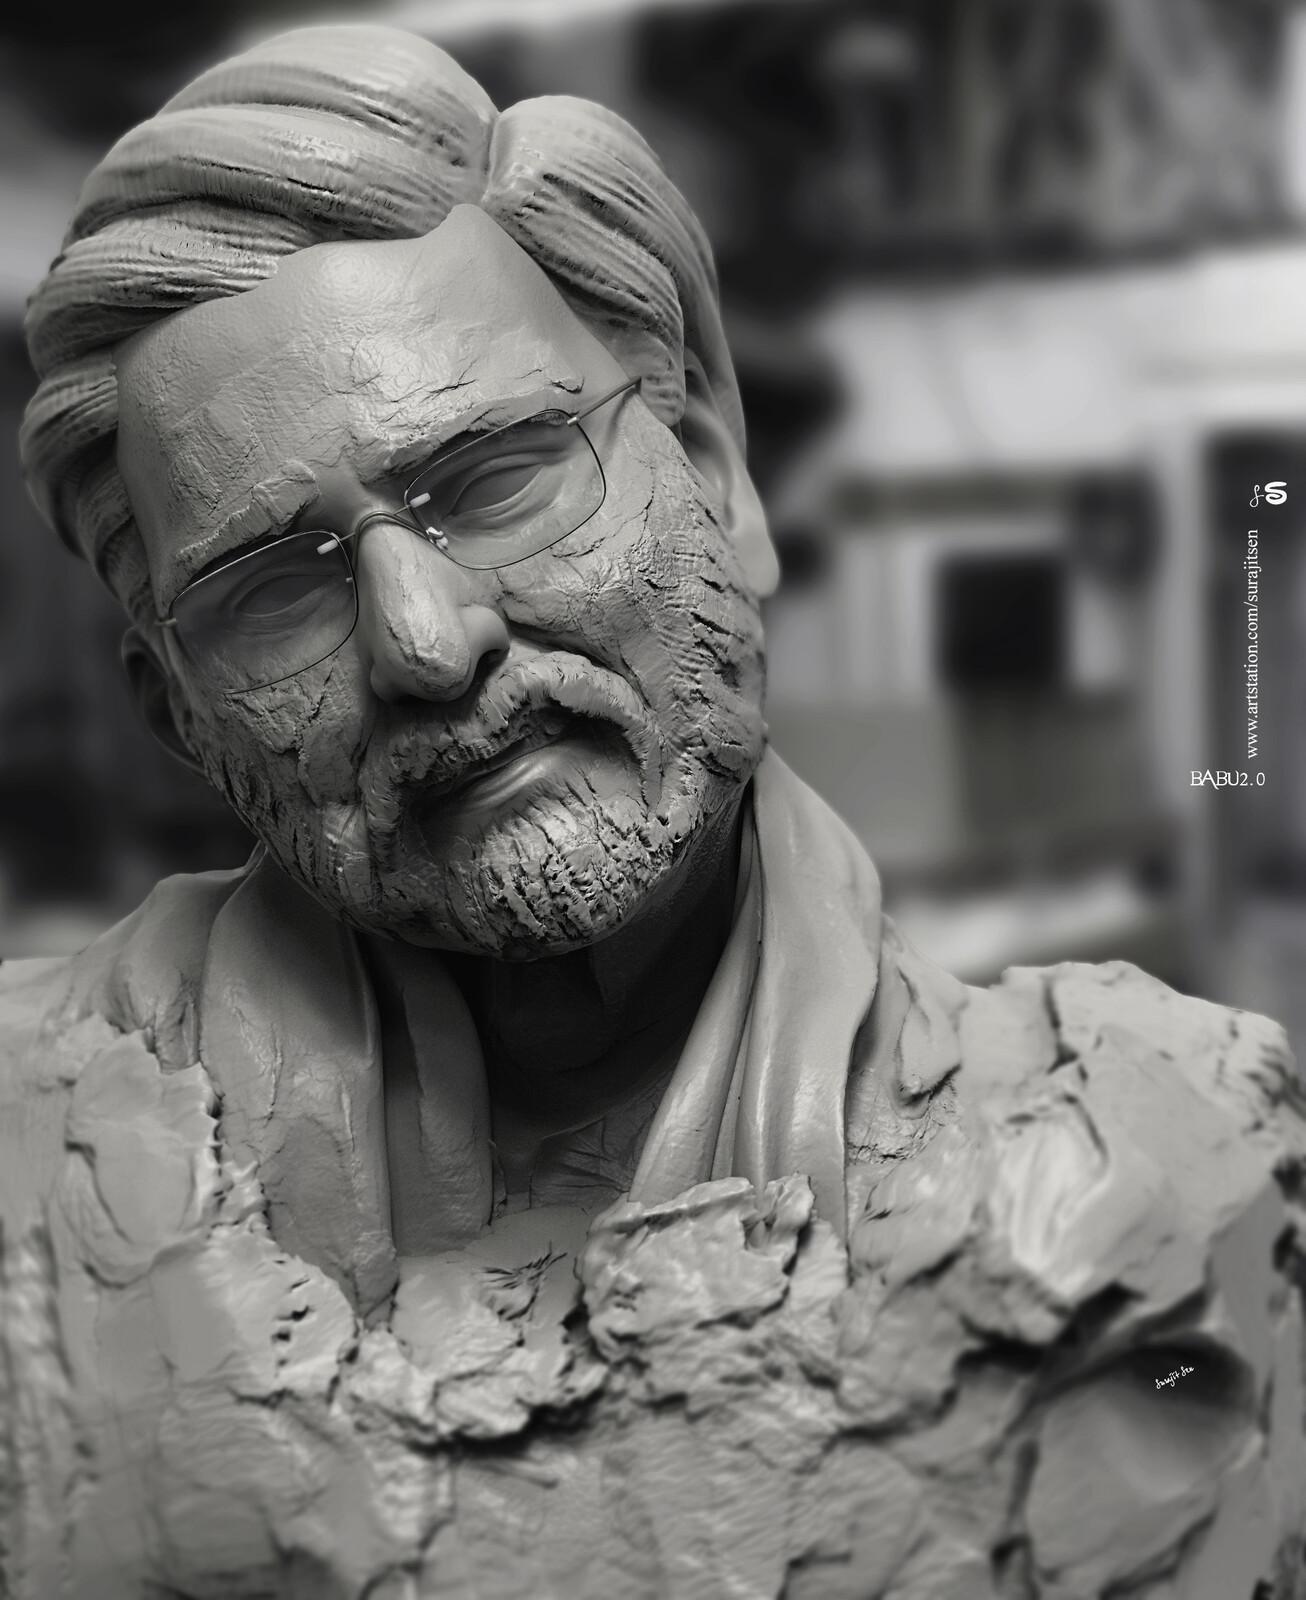 My free time speed Digital Sculpting study... Babu2.0 Background music- #hanszimmermusic